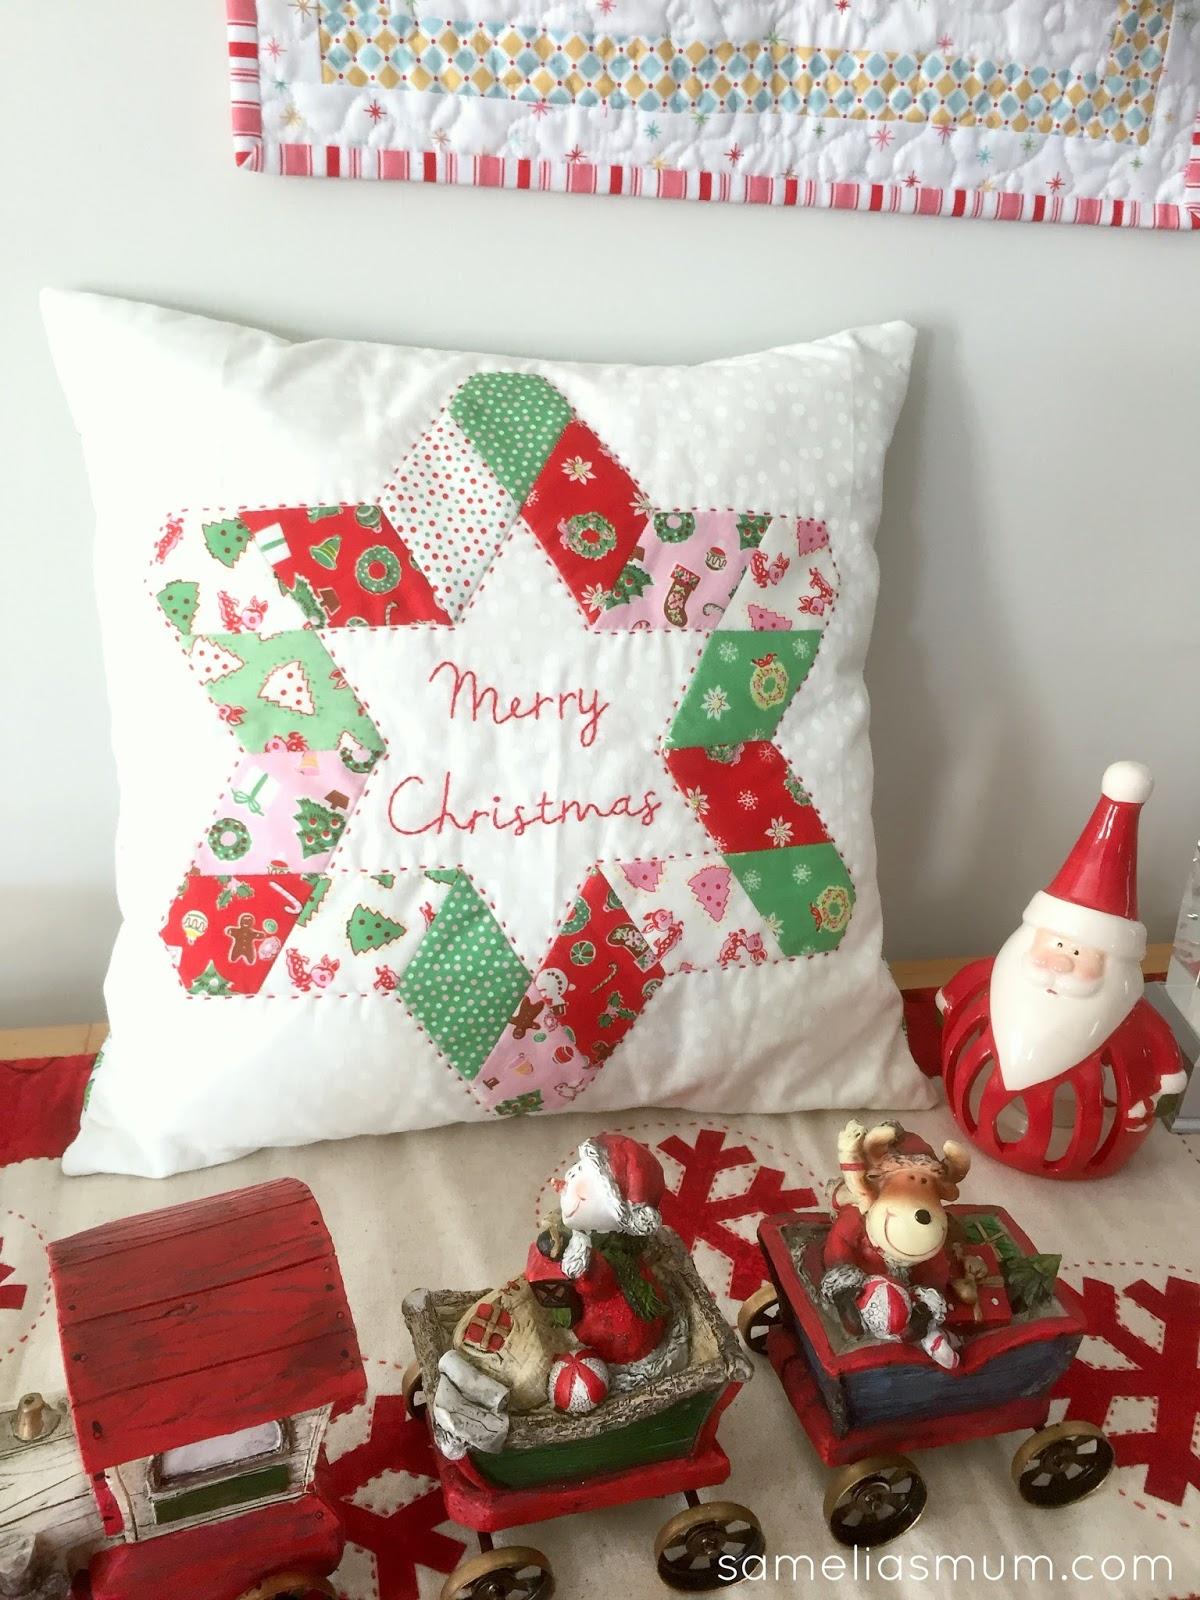 A Star For Christmas.A Star For Christmas Cushion Samelia S Mum